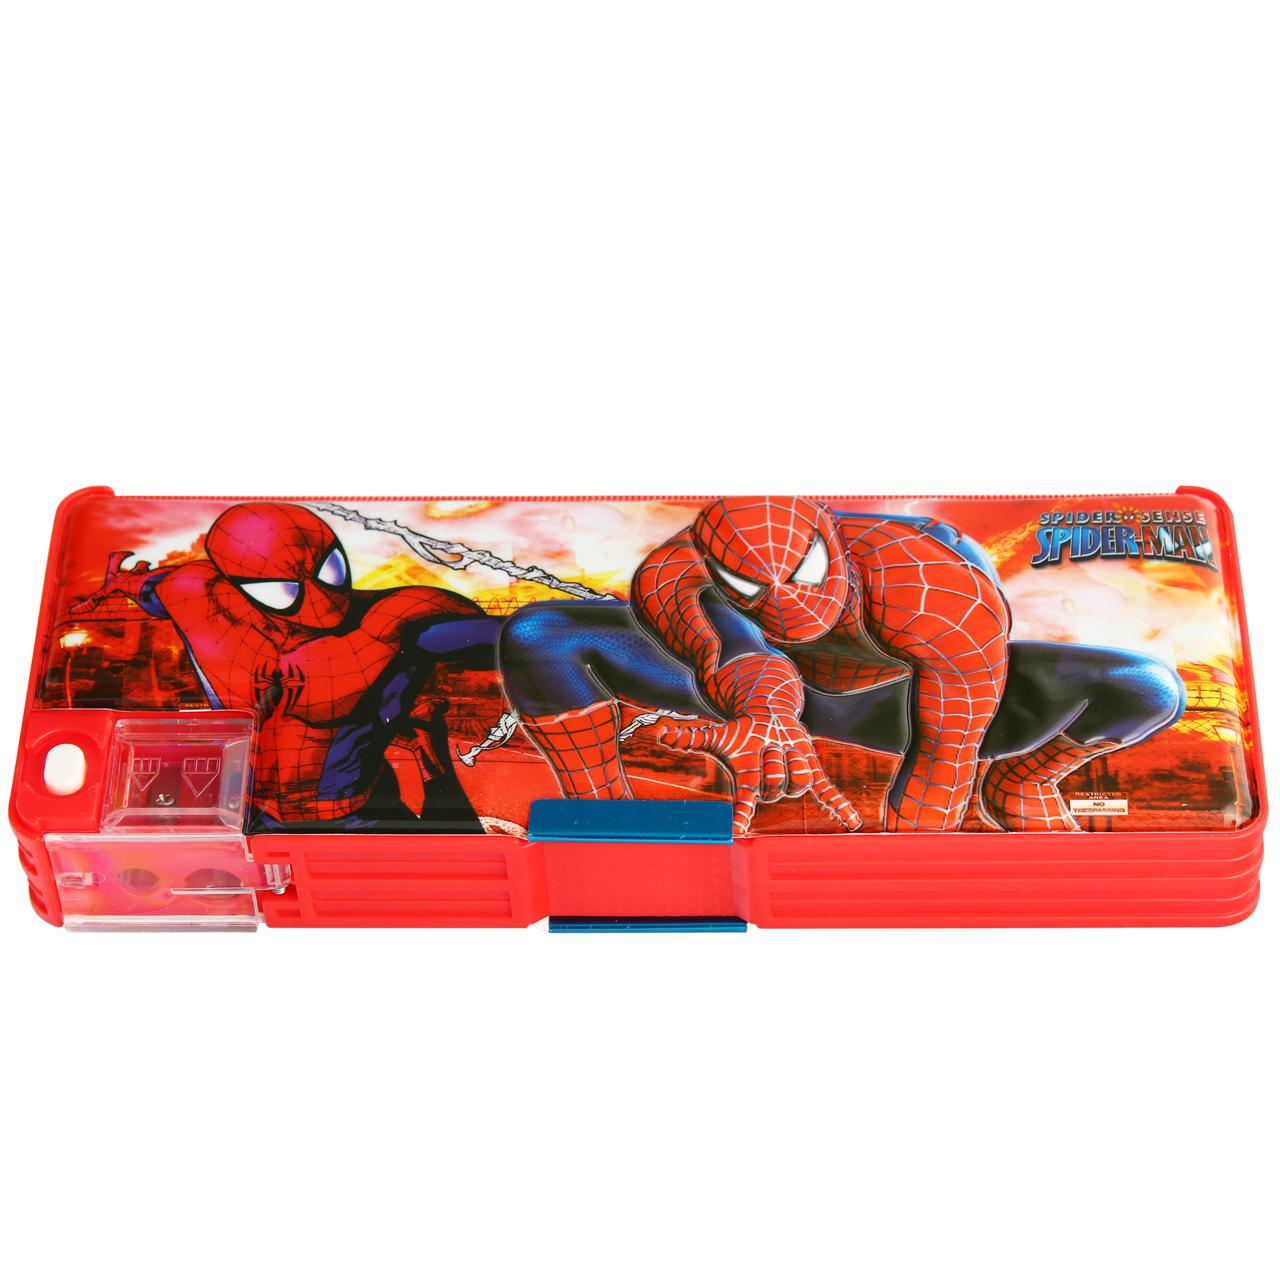 جامدادی طرح مرد عنکبوتی کد 25030025